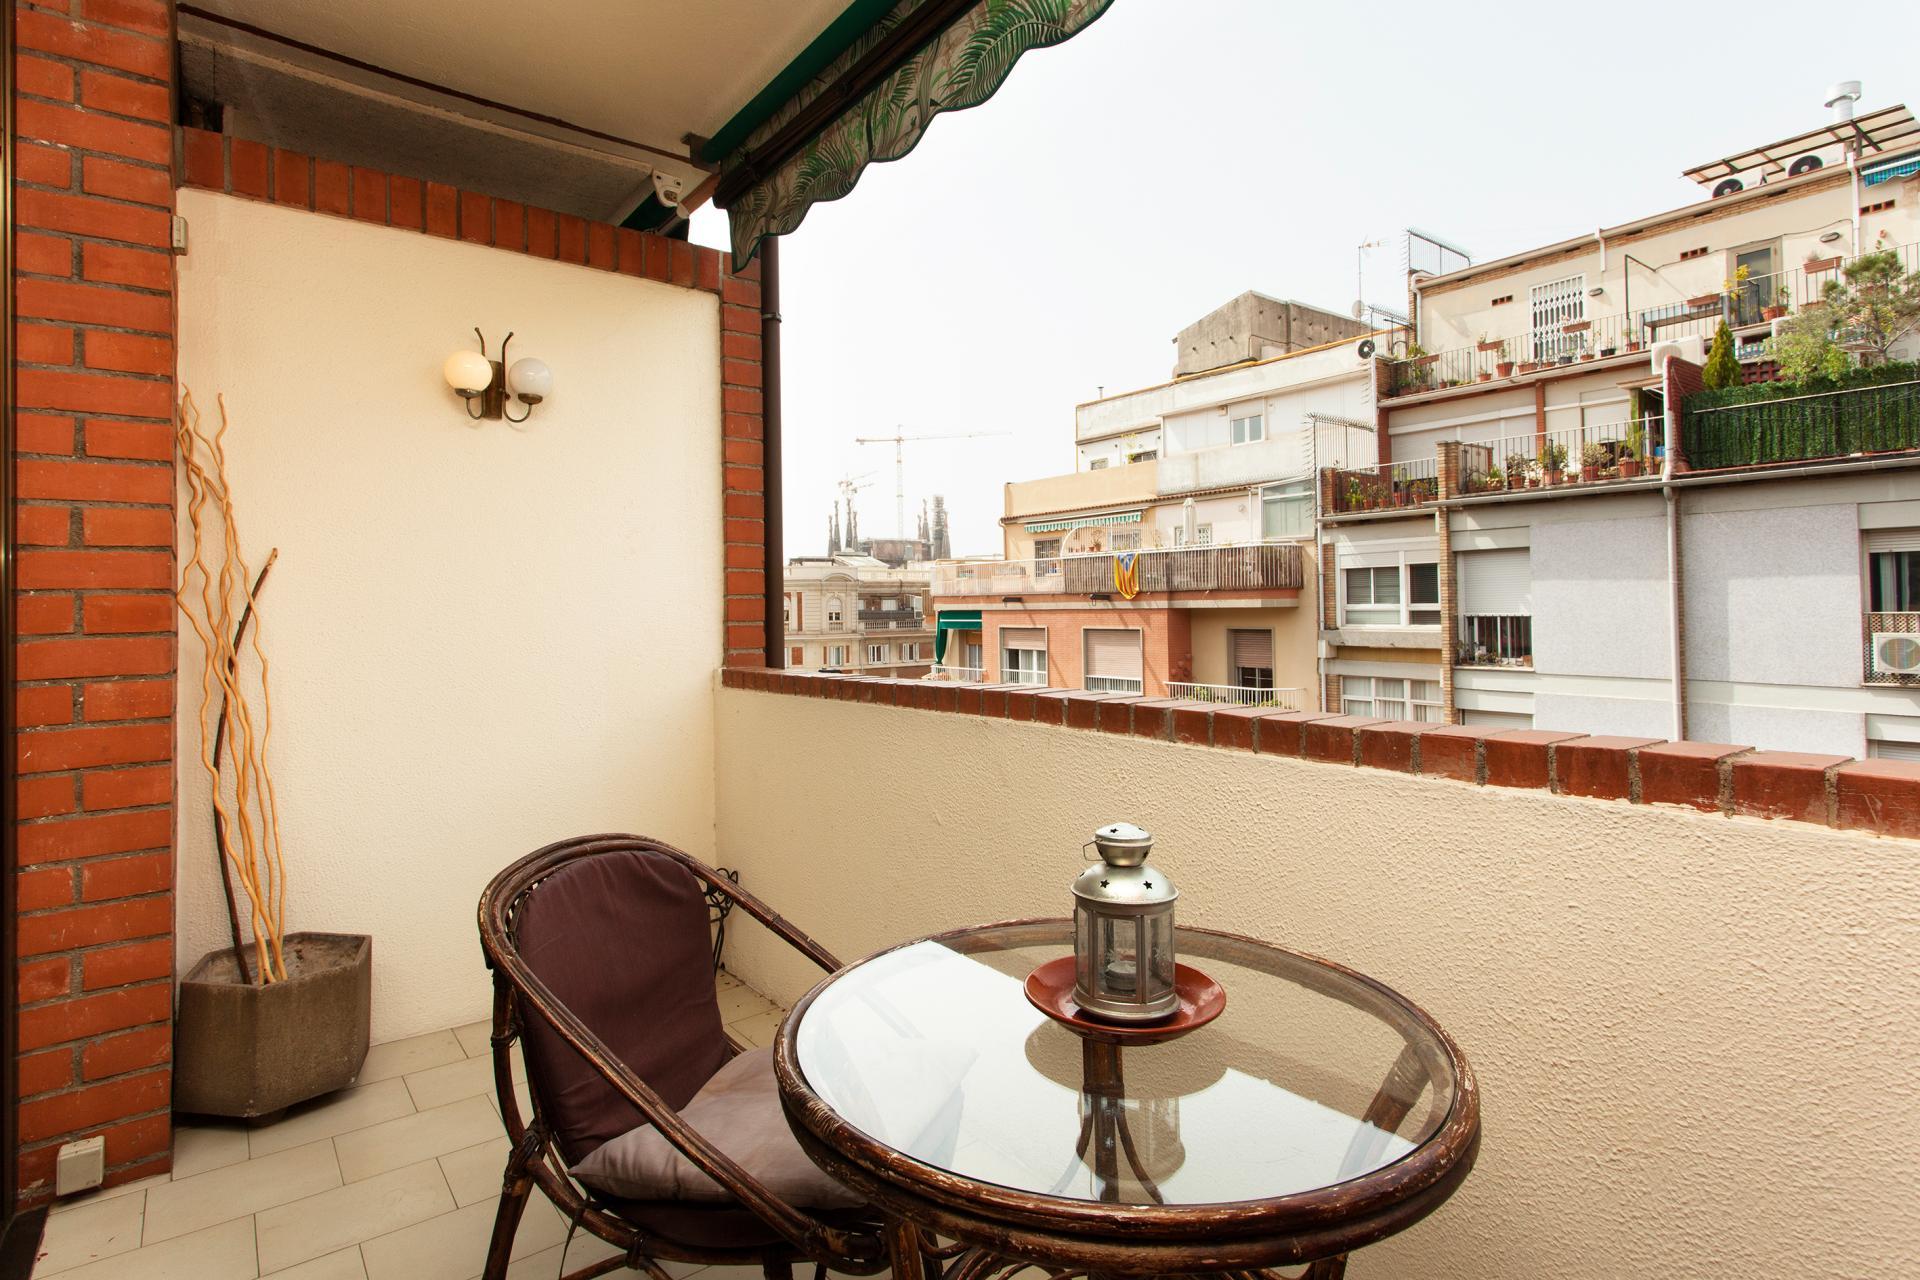 Shbarcelona alquiler piso en barrio sagrada familia - Pisos en alquiler en barcelona particular sagrada familia ...